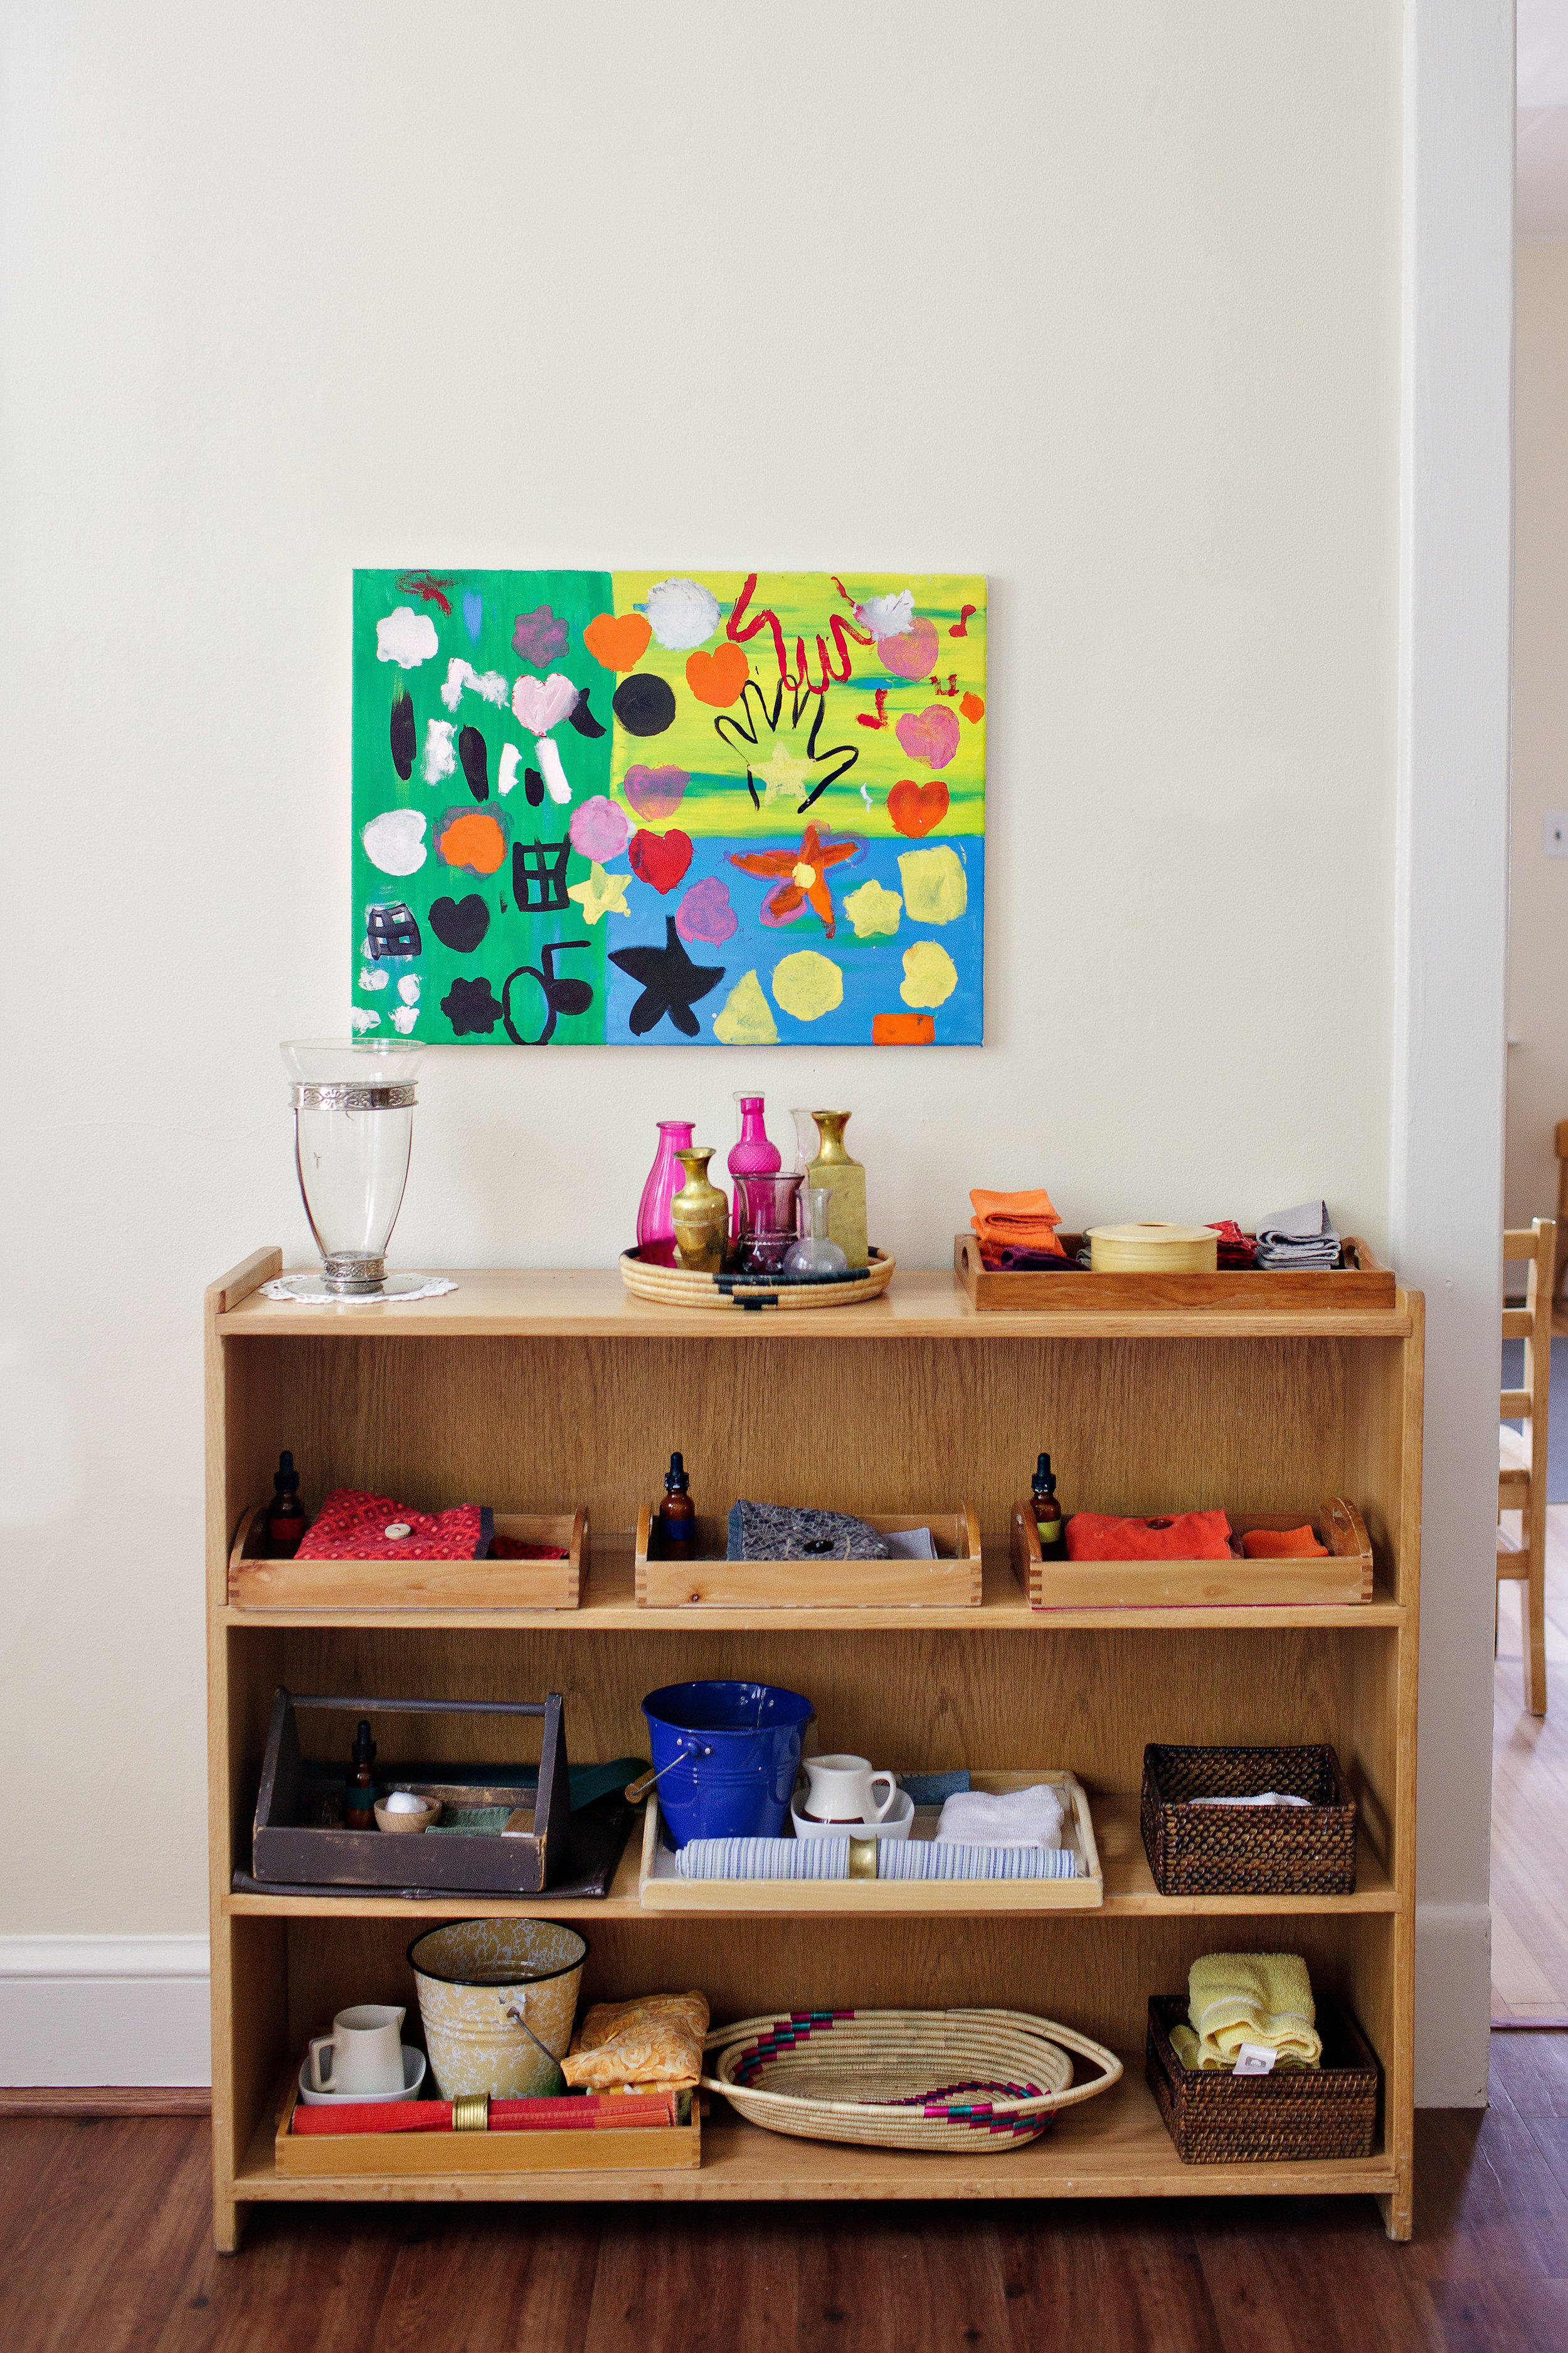 Practical Life shelves